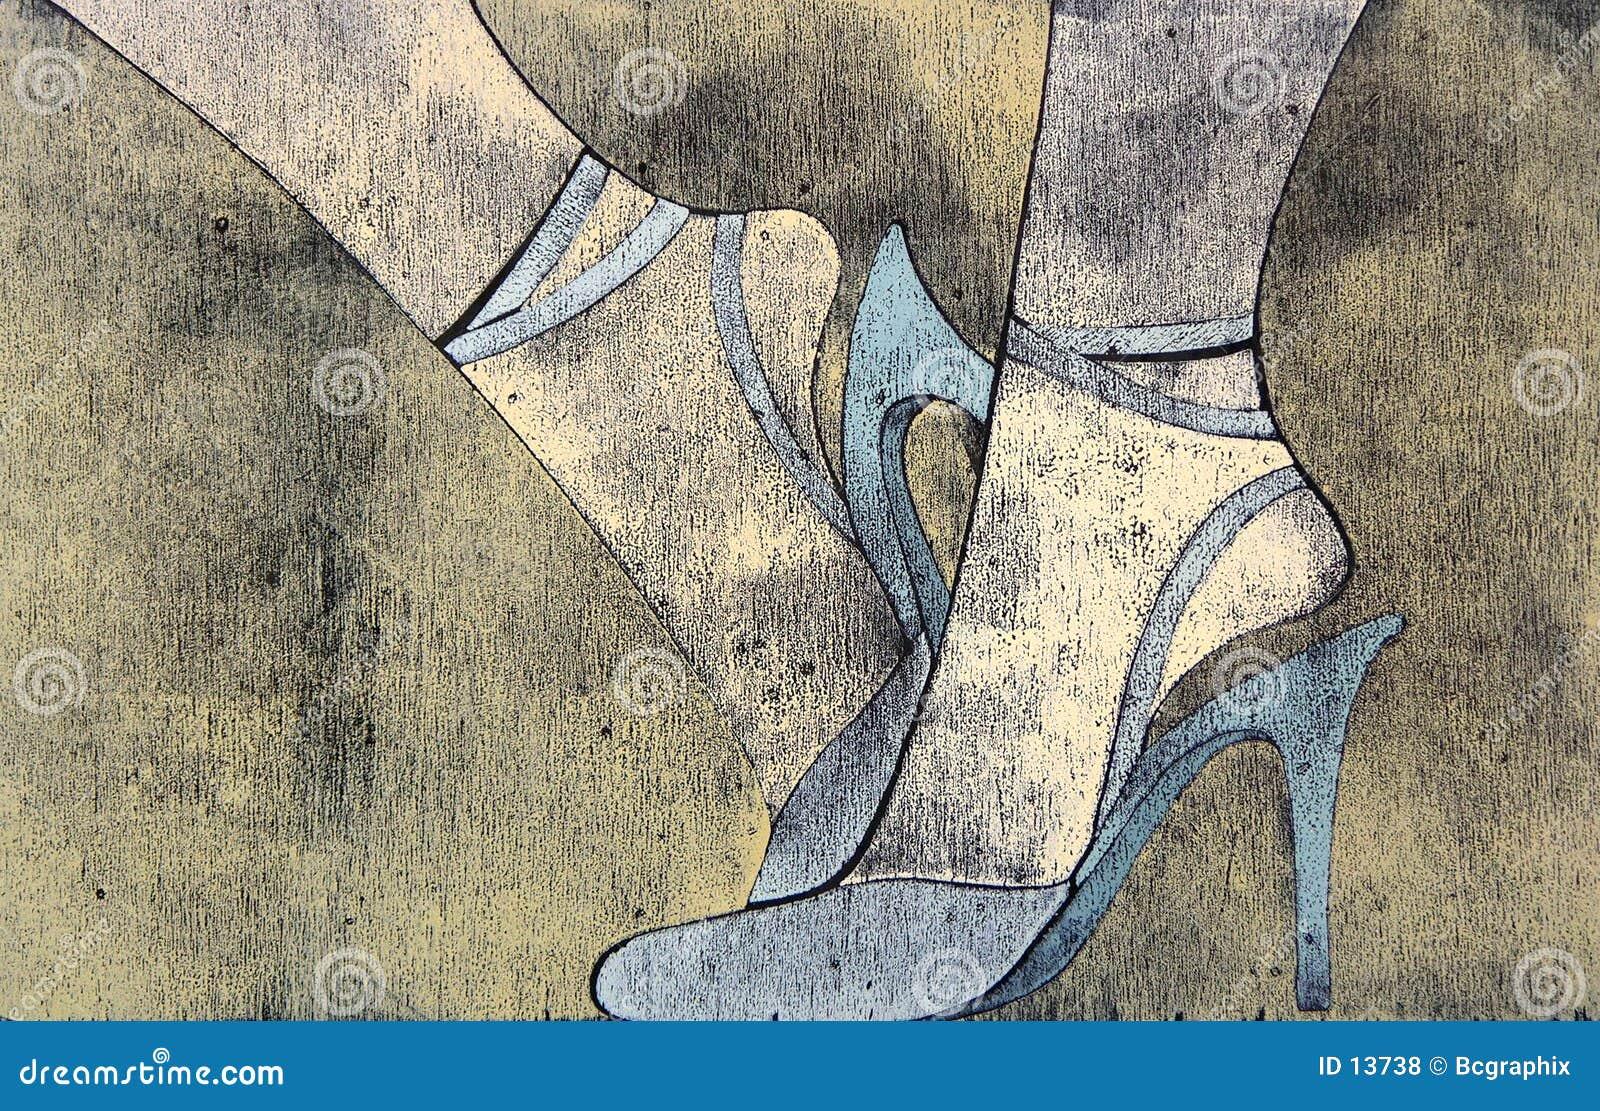 Woodprint of woman s legs wearing sandals.